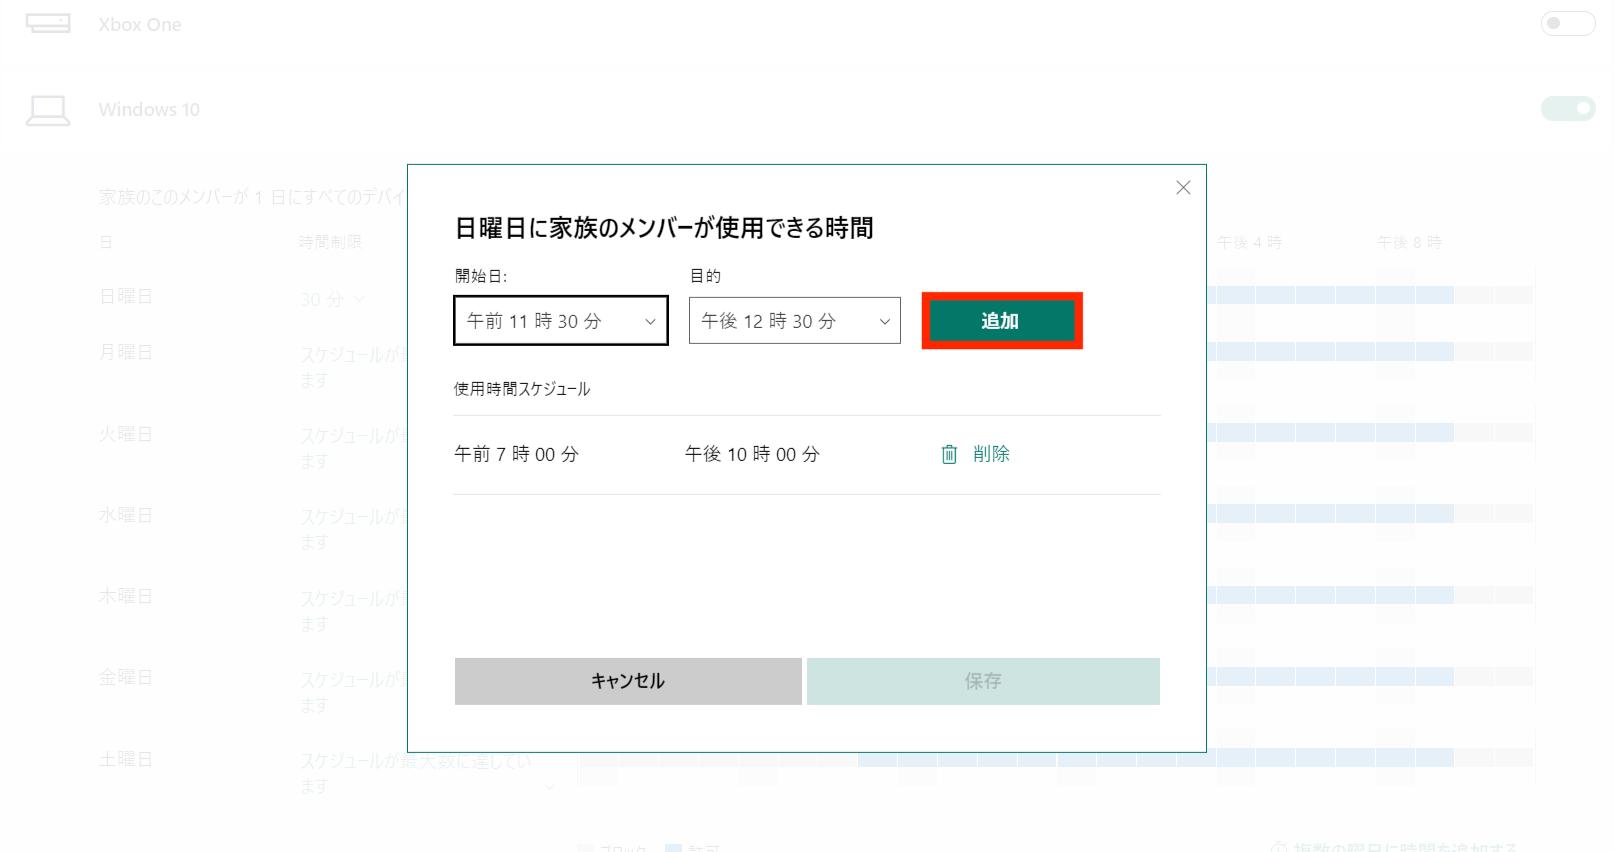 【Windows】ファミリー機能の使い方9